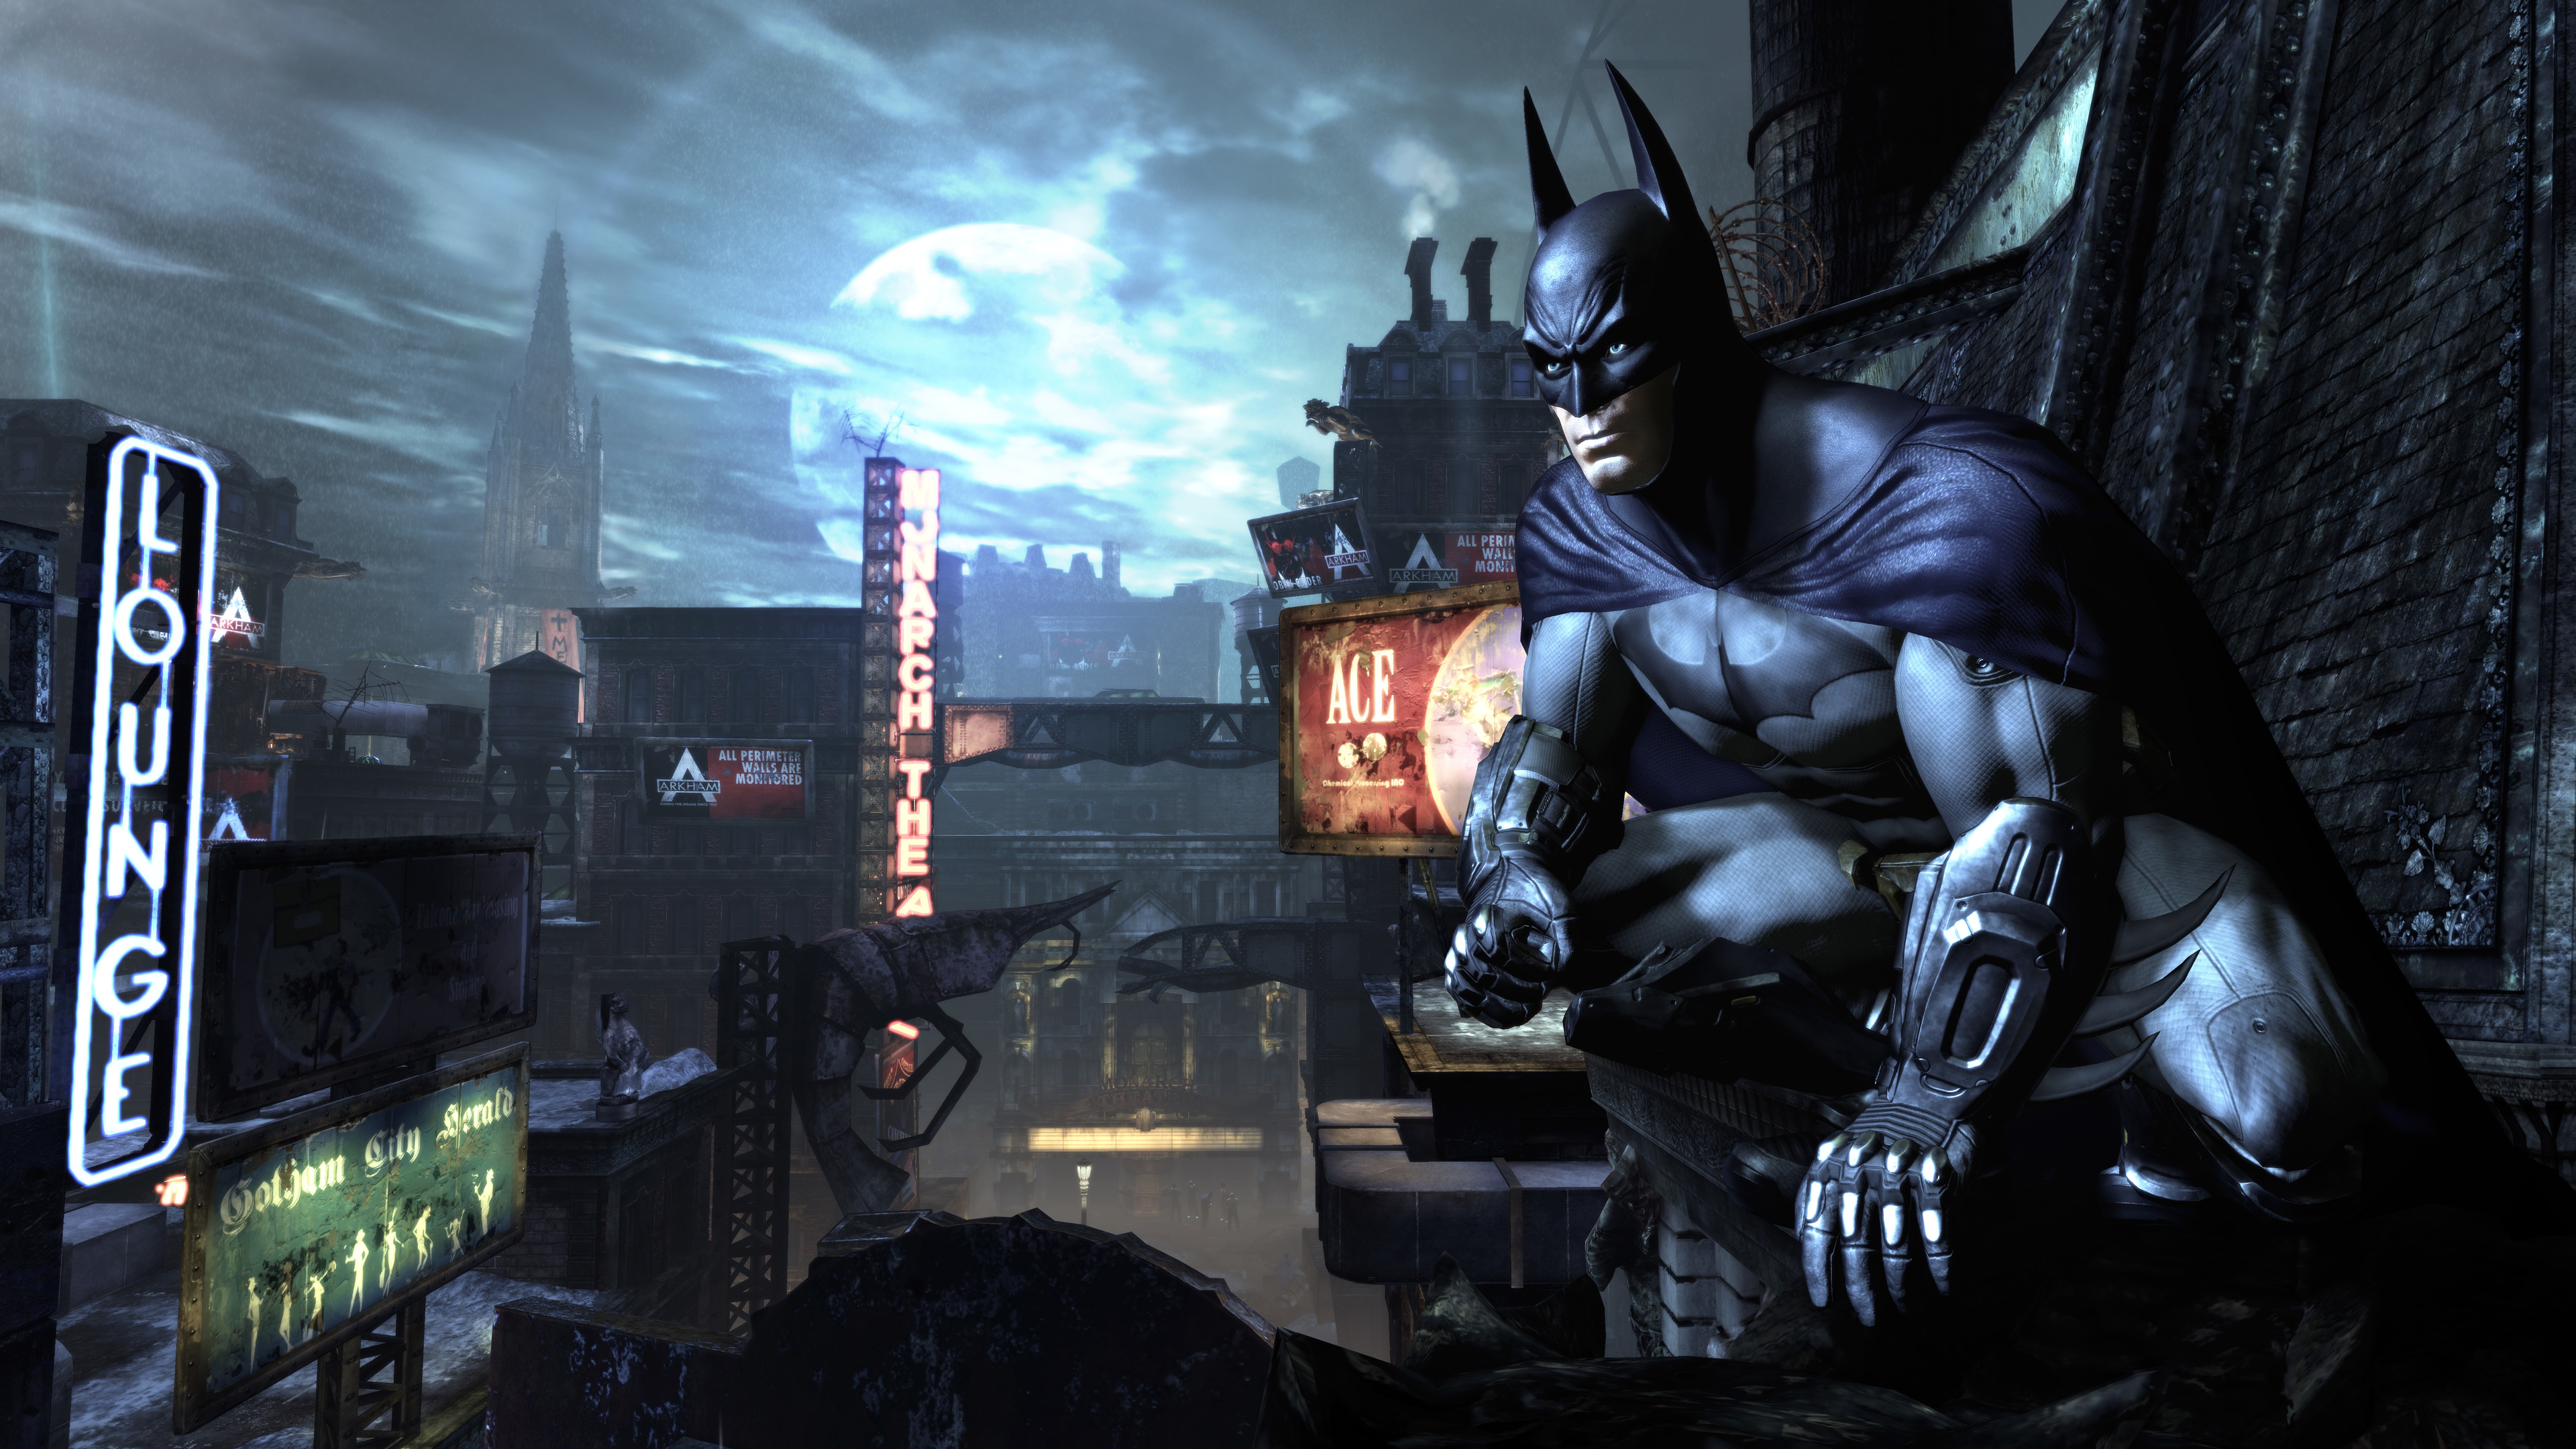 batman watching gotham city in the night 1536523936 - Batman Watching Gotham City In The Night - superheroes wallpapers, hd-wallpapers, digital art wallpapers, batman wallpapers, artwork wallpapers, 5k wallpapers, 4k-wallpapers